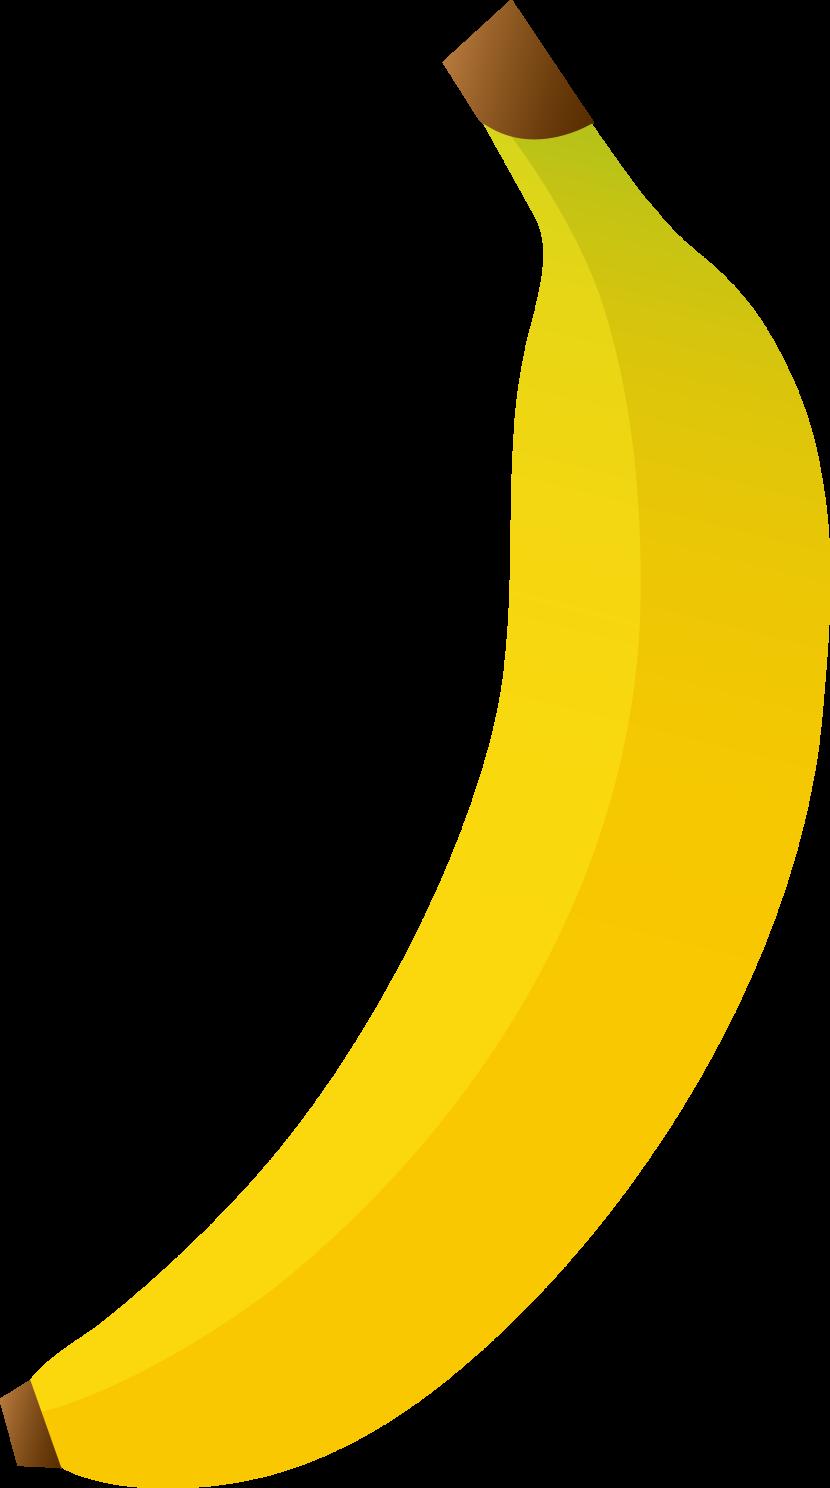 Banana clip art free. Bananas clipart babana